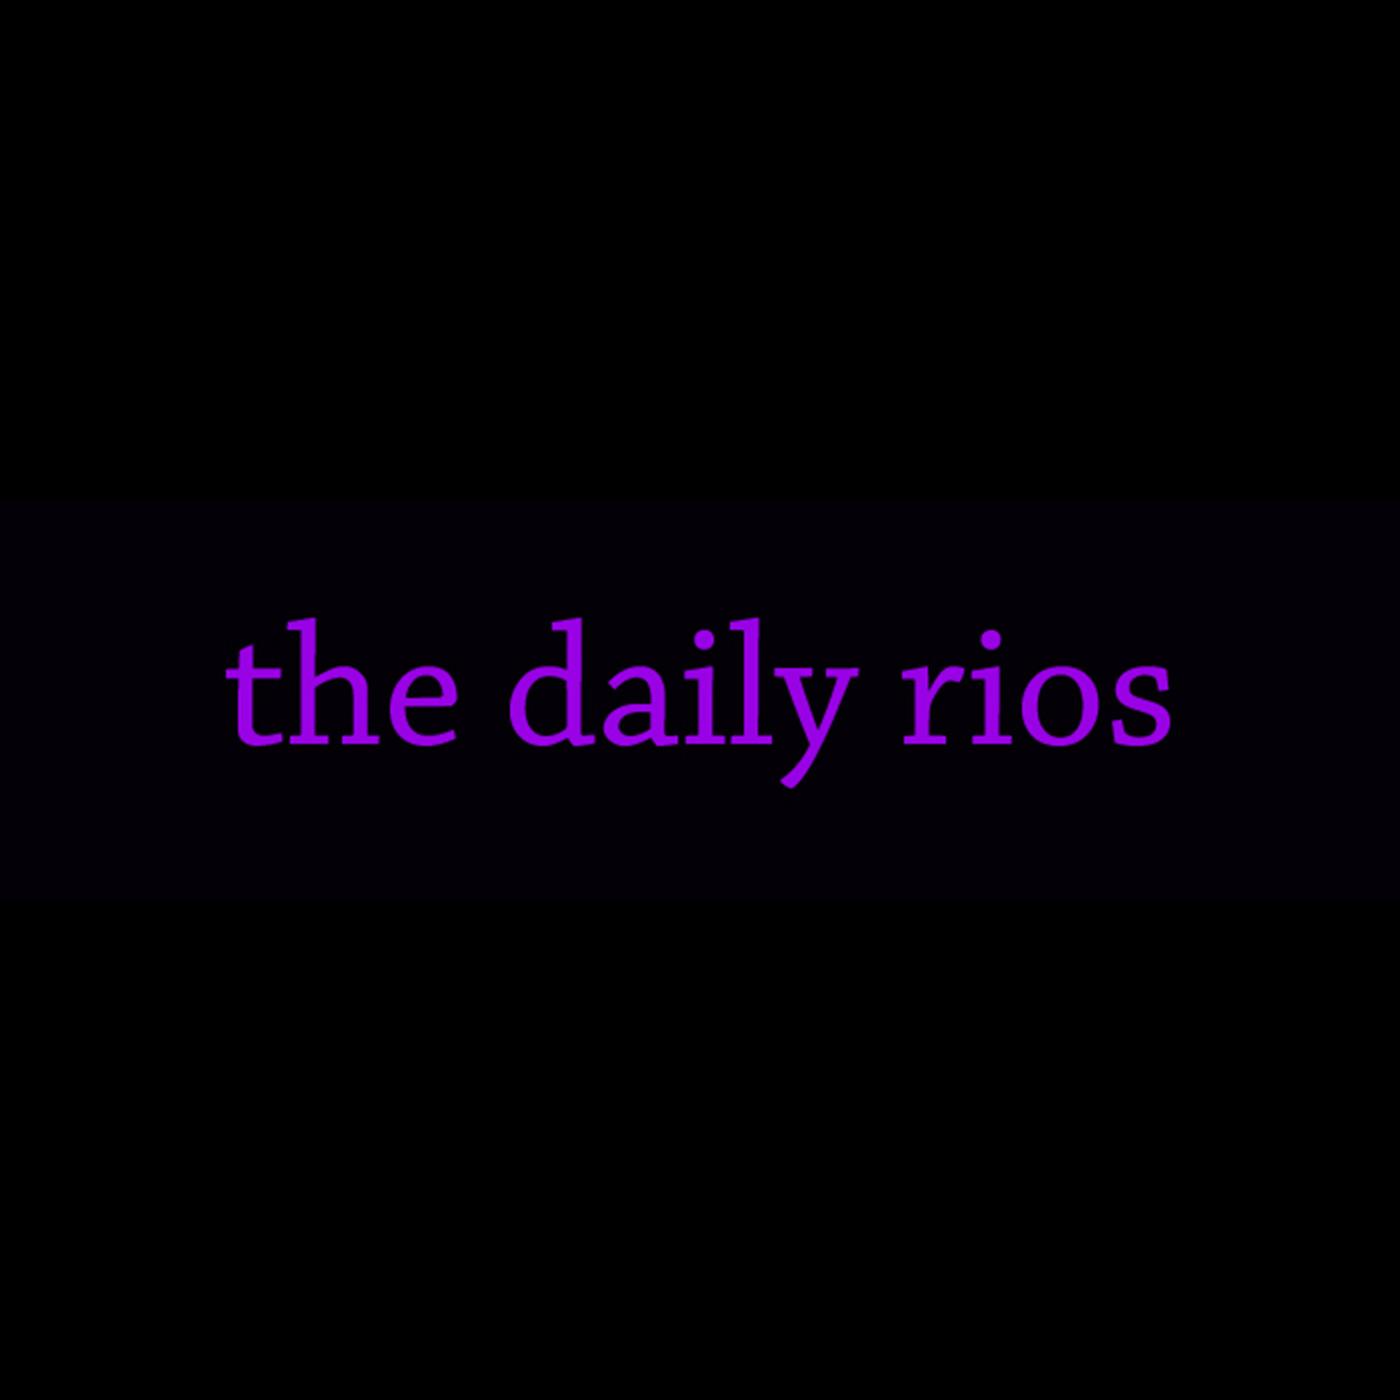 The Daily Rios